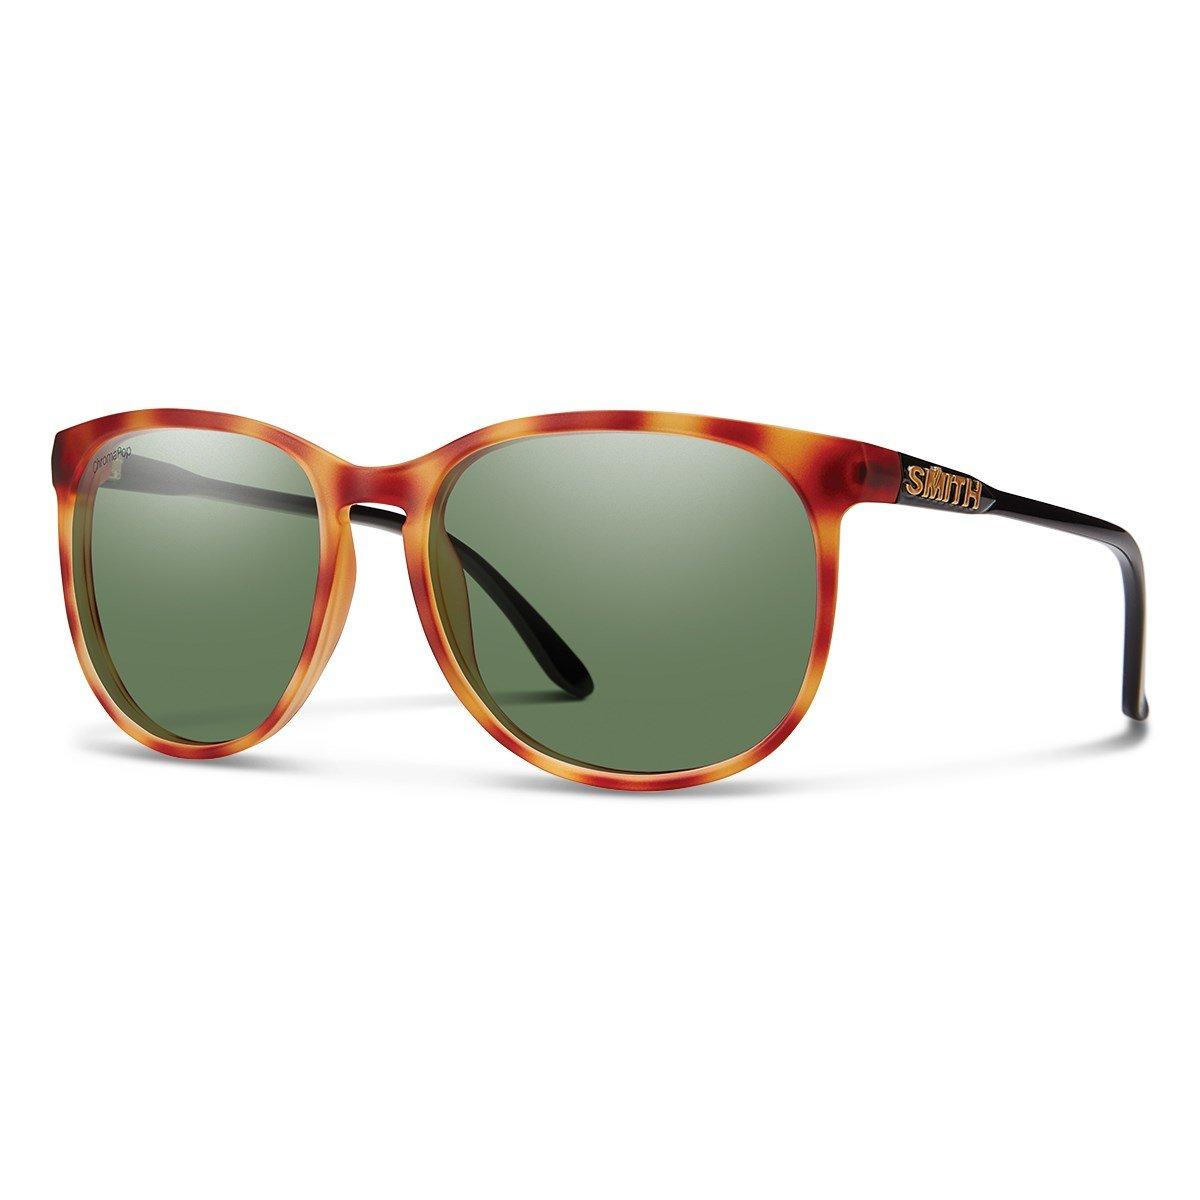 1cefde58543d Smith Mt. Shasta Sunglasses